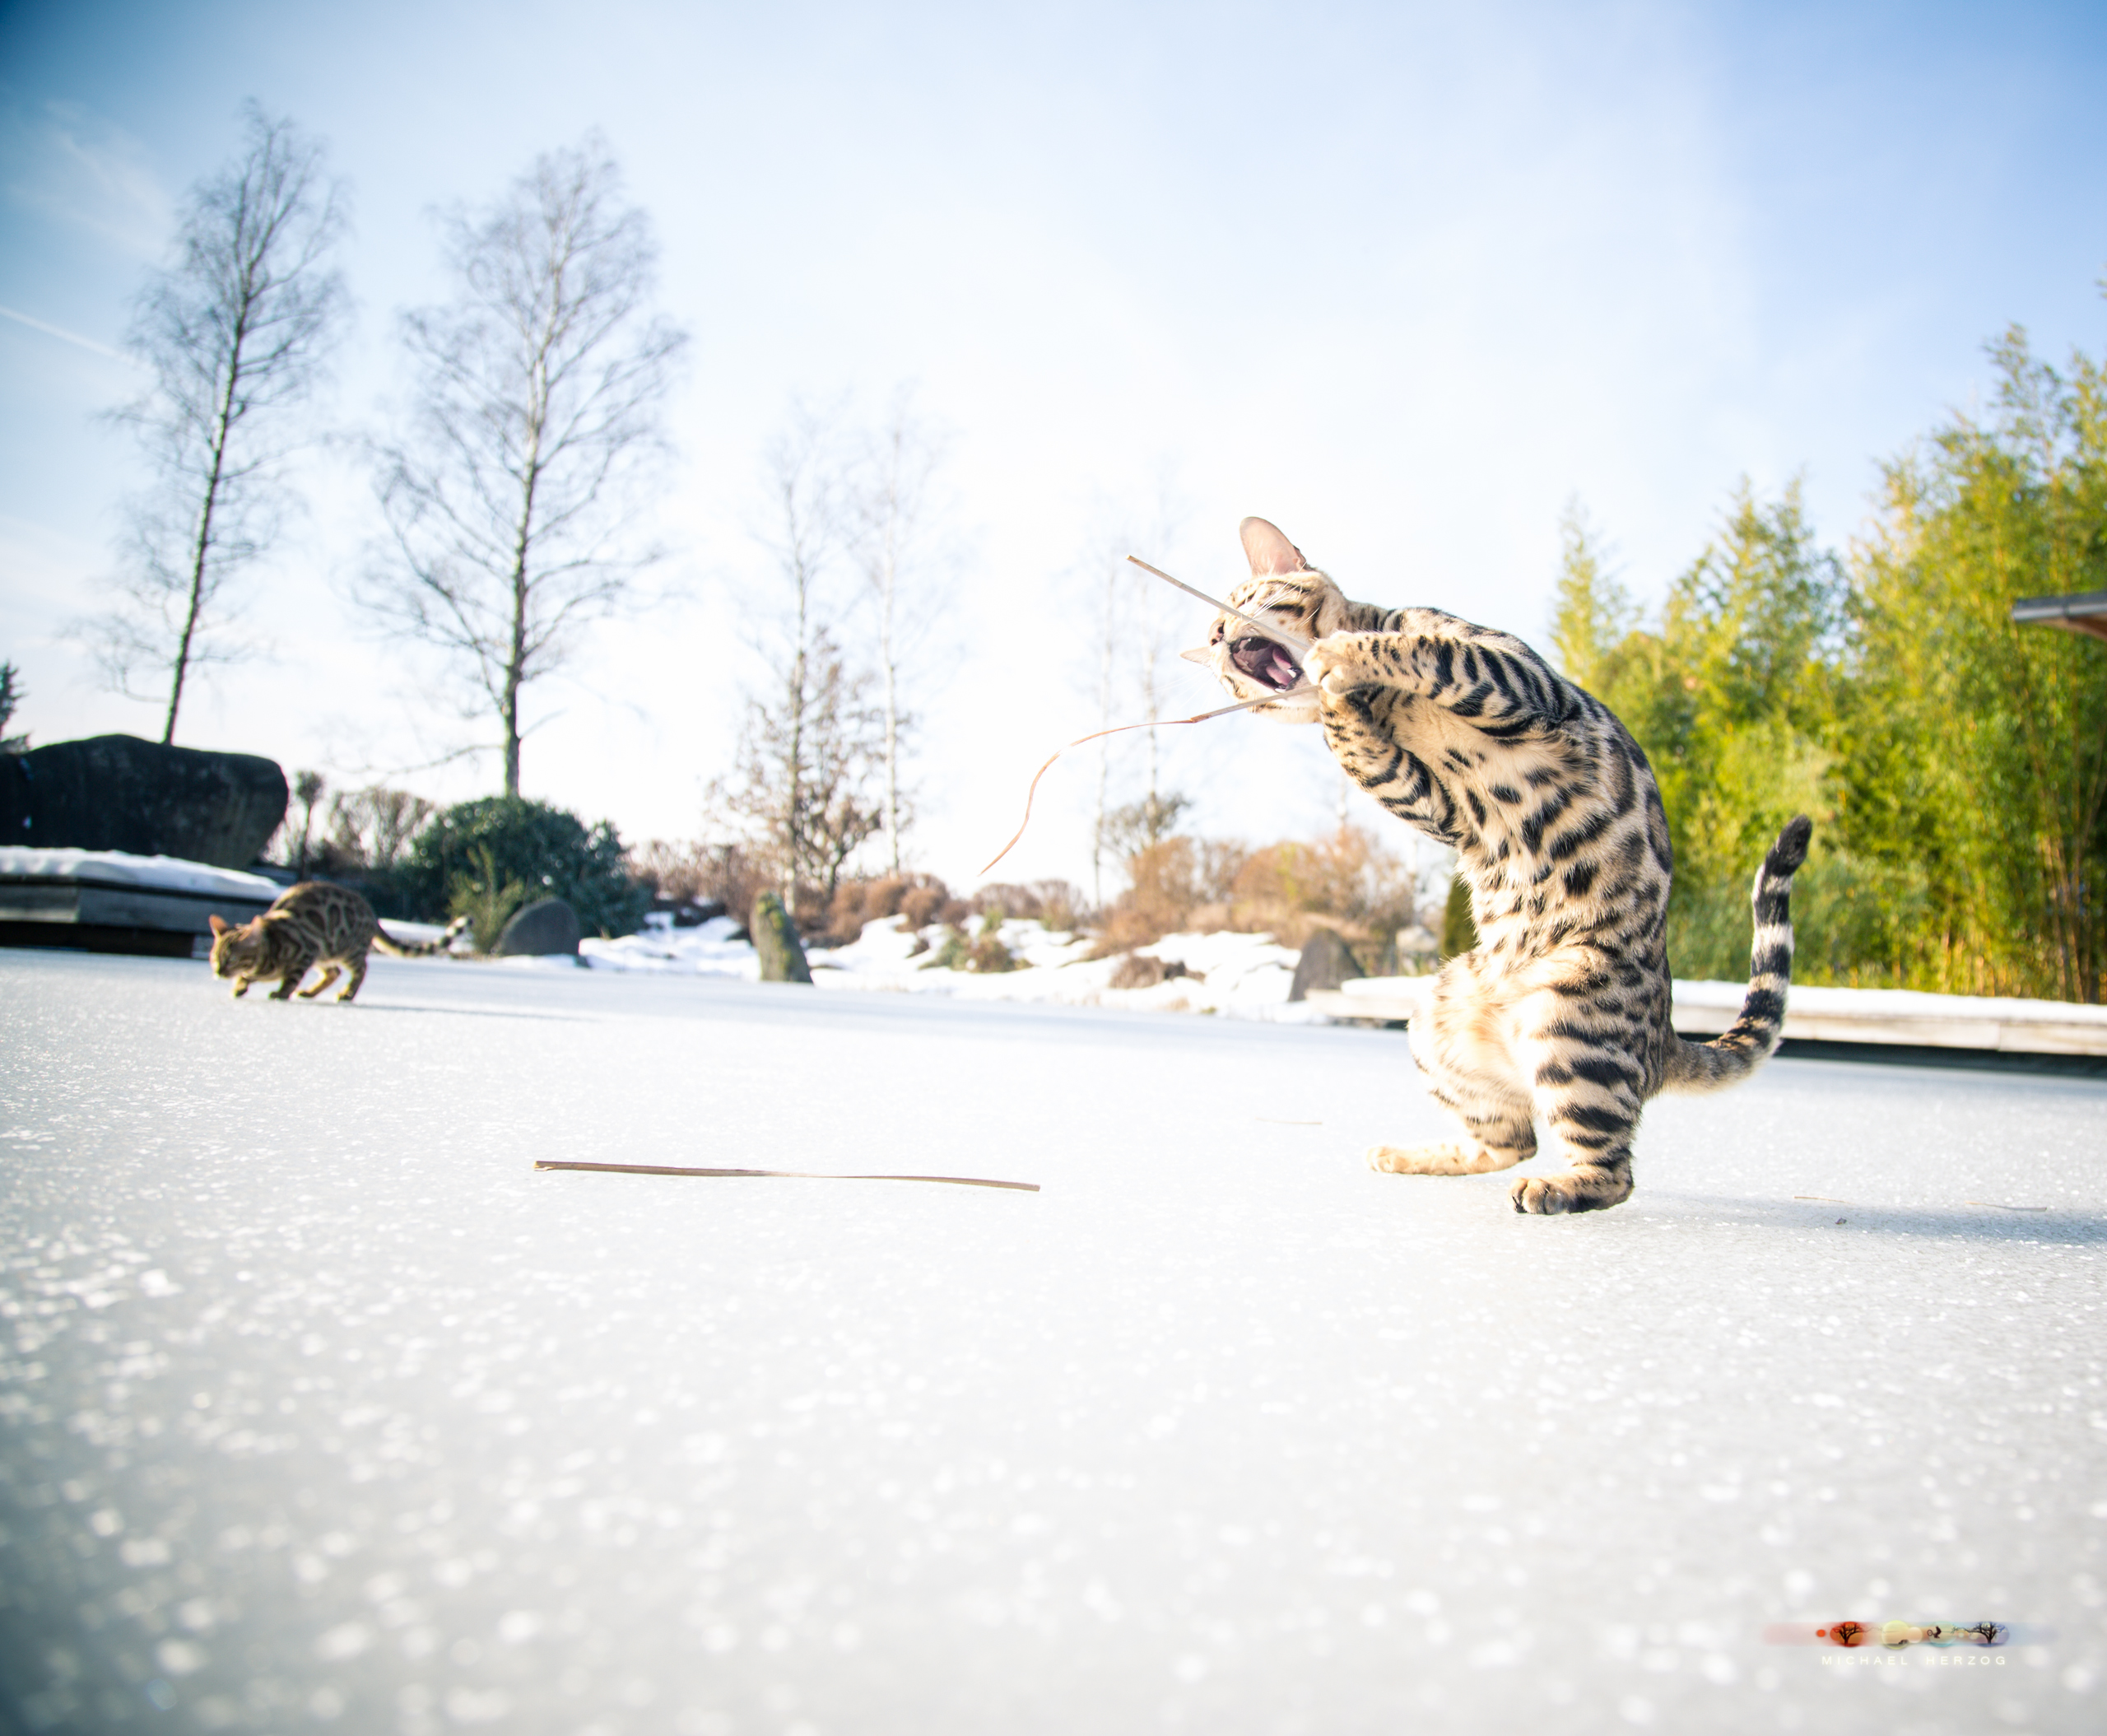 BALUARI_Winter2019_Garten_MichaelHerzog-8883.jpg